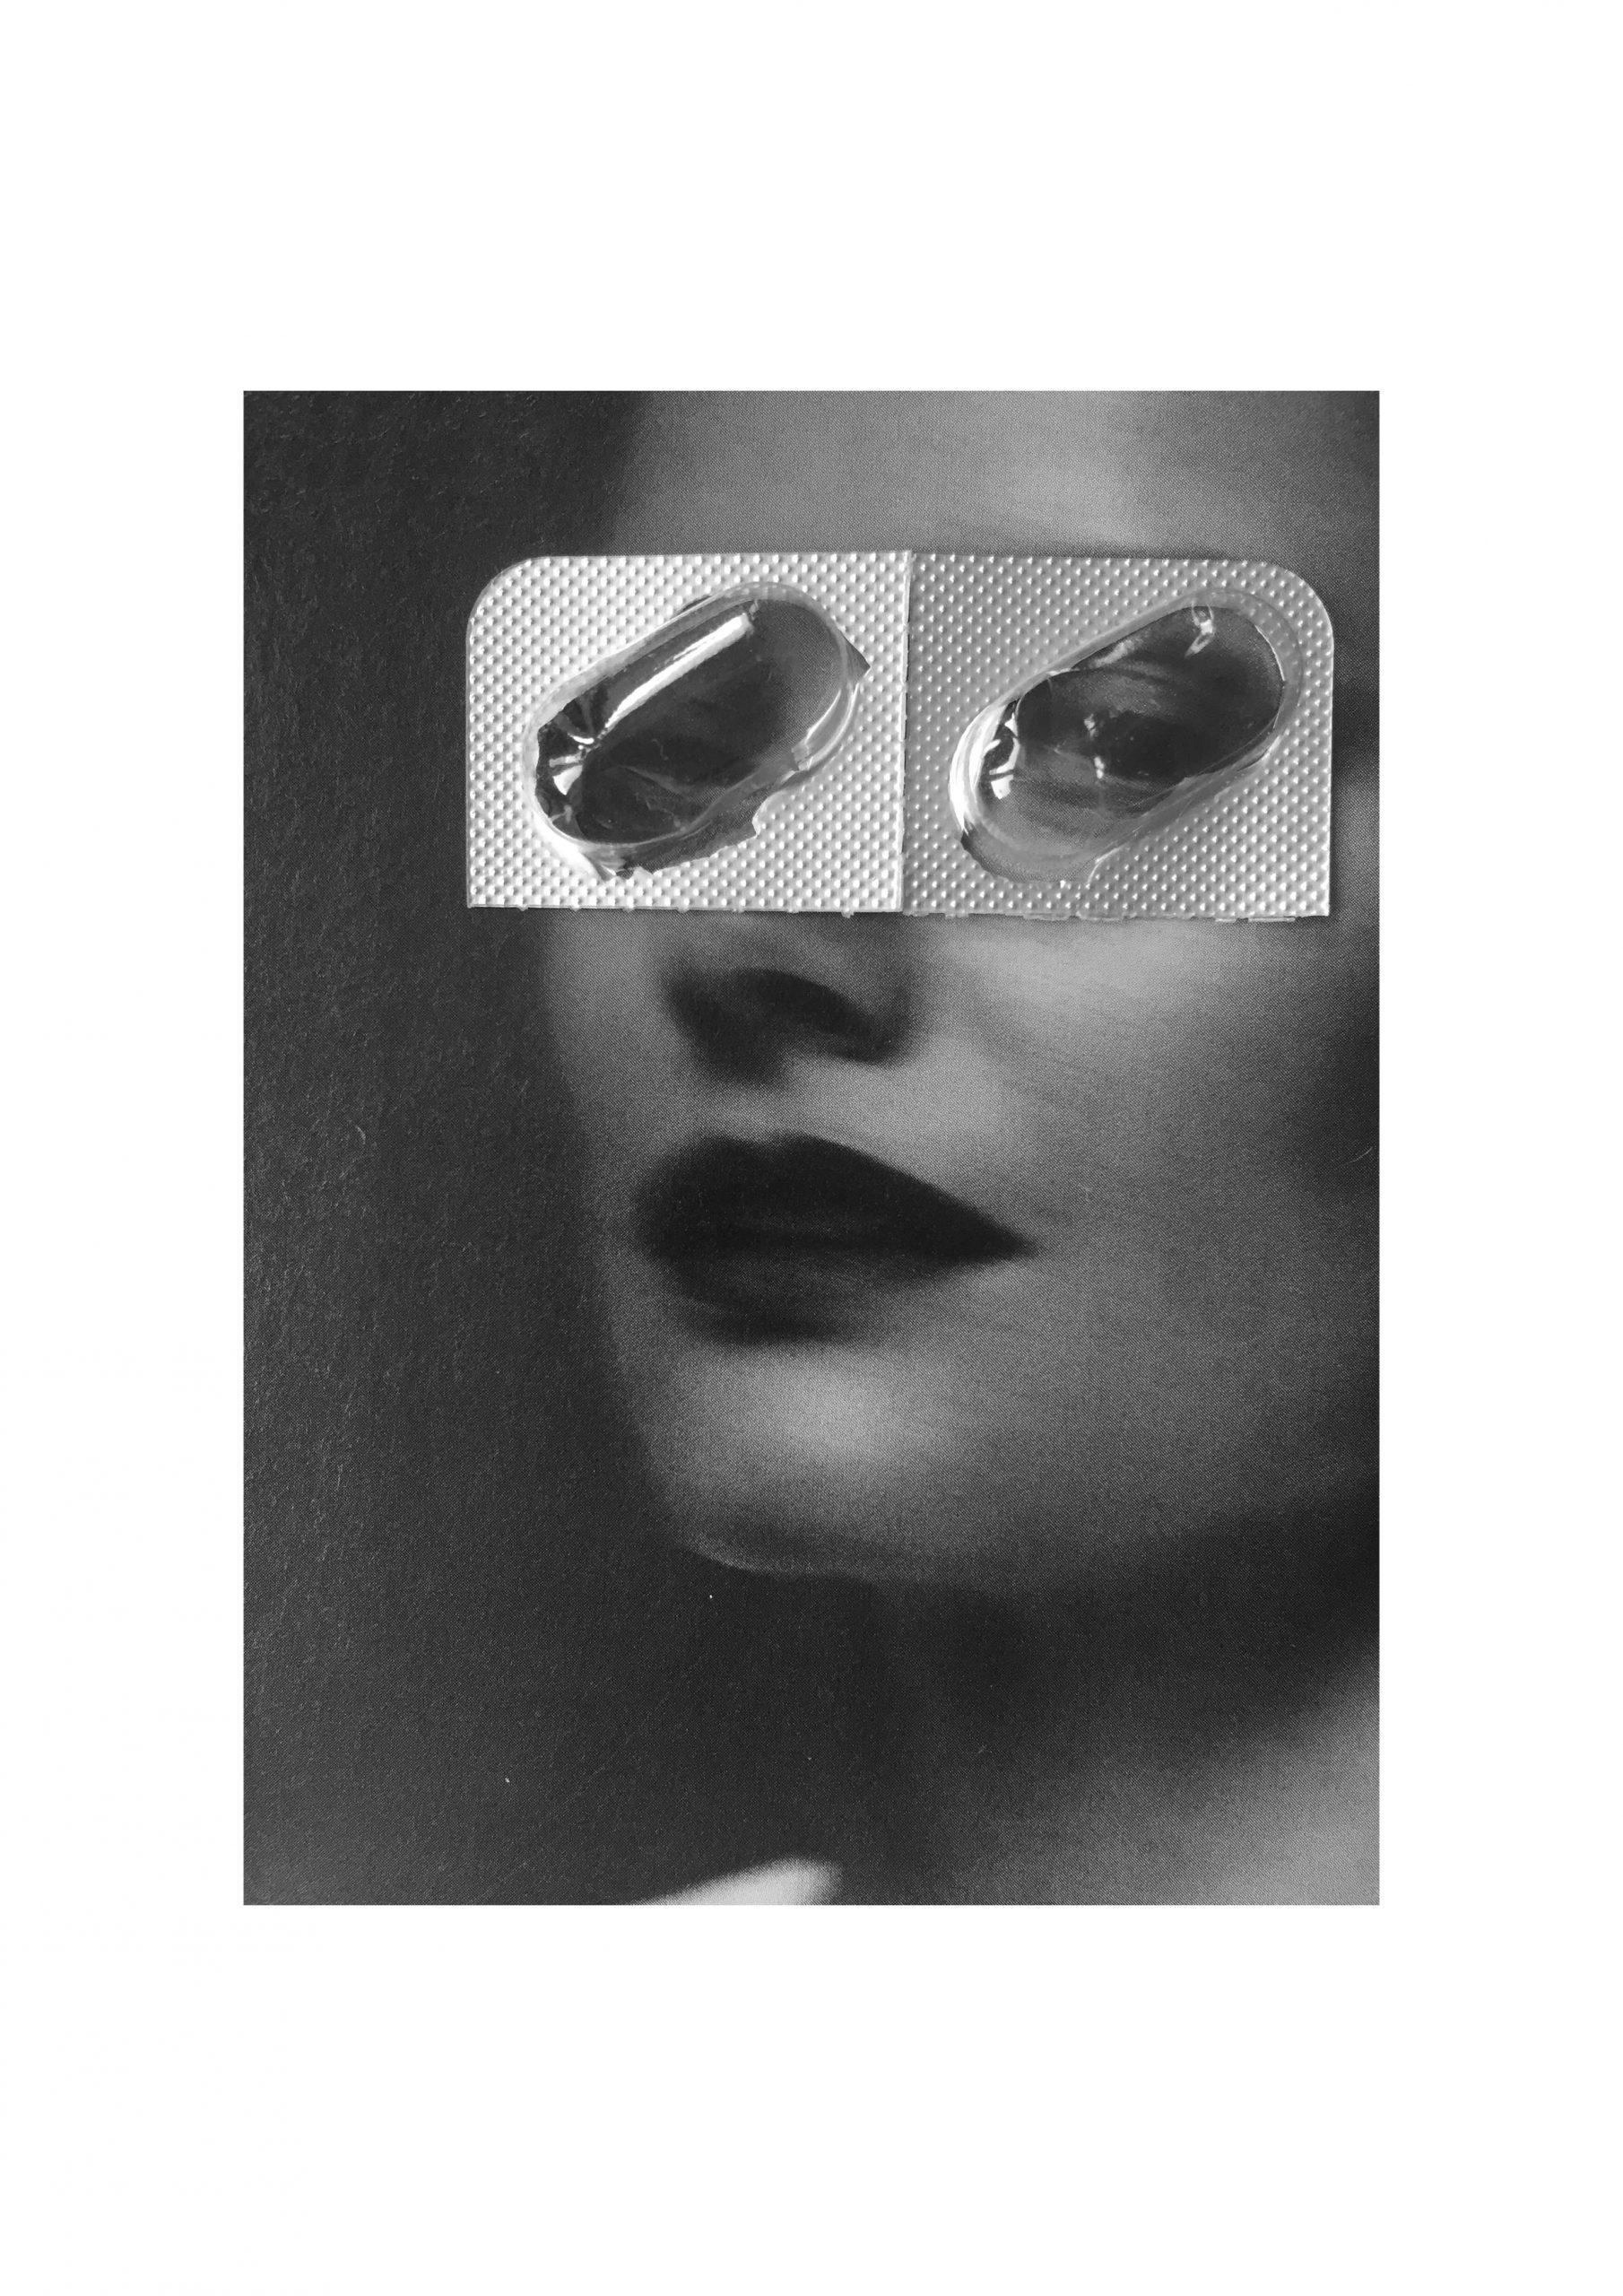 Skizze Augen tablettenschachtel